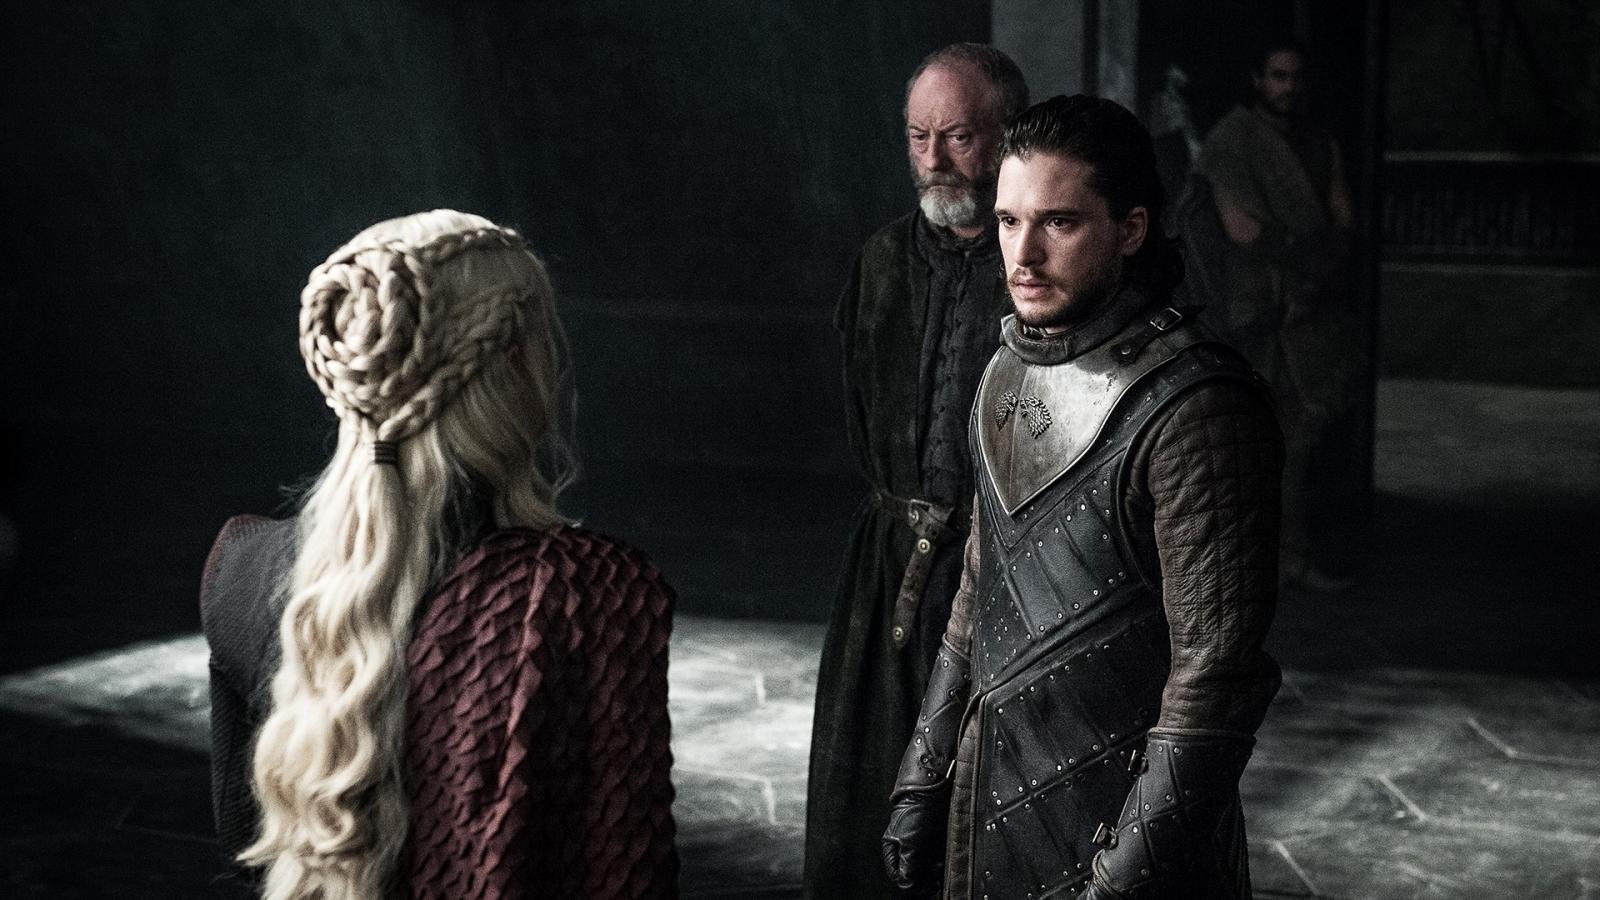 Jon Snow And Daenerys Sex Scene Teased In Game Of Thrones Season 7